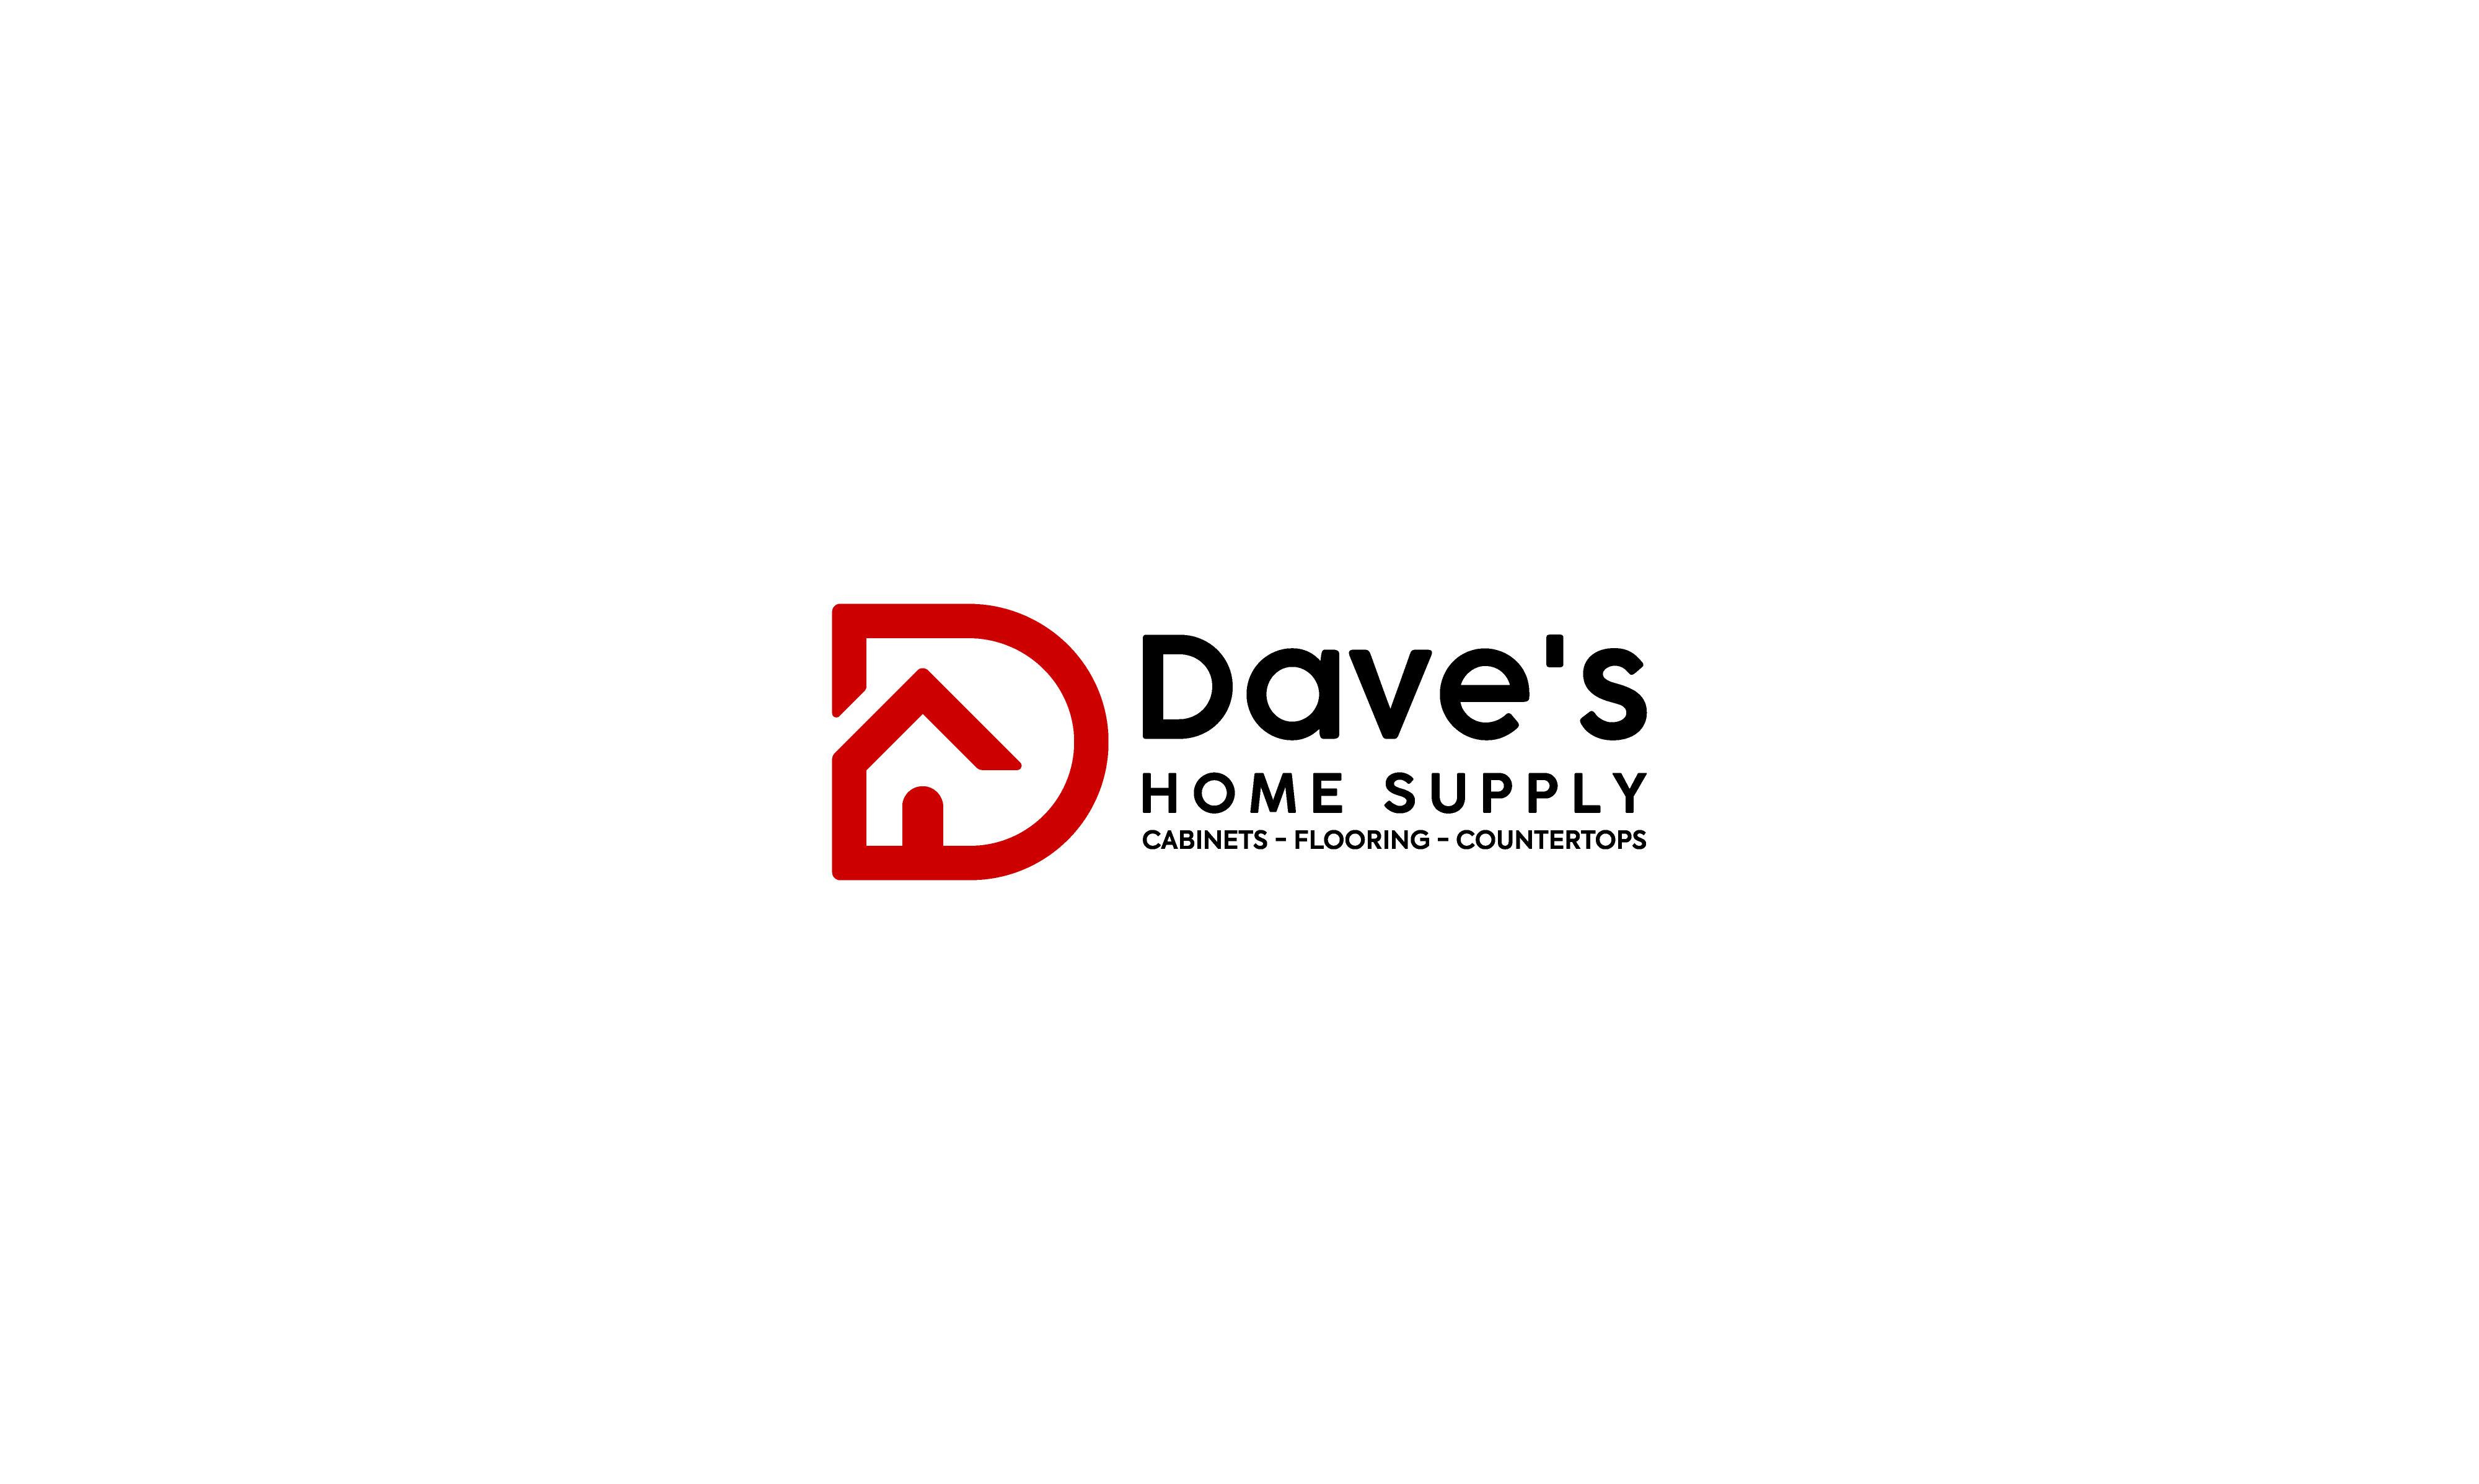 Dave's Home Supply - 171 Ehrman Way, Medford, OR 97501